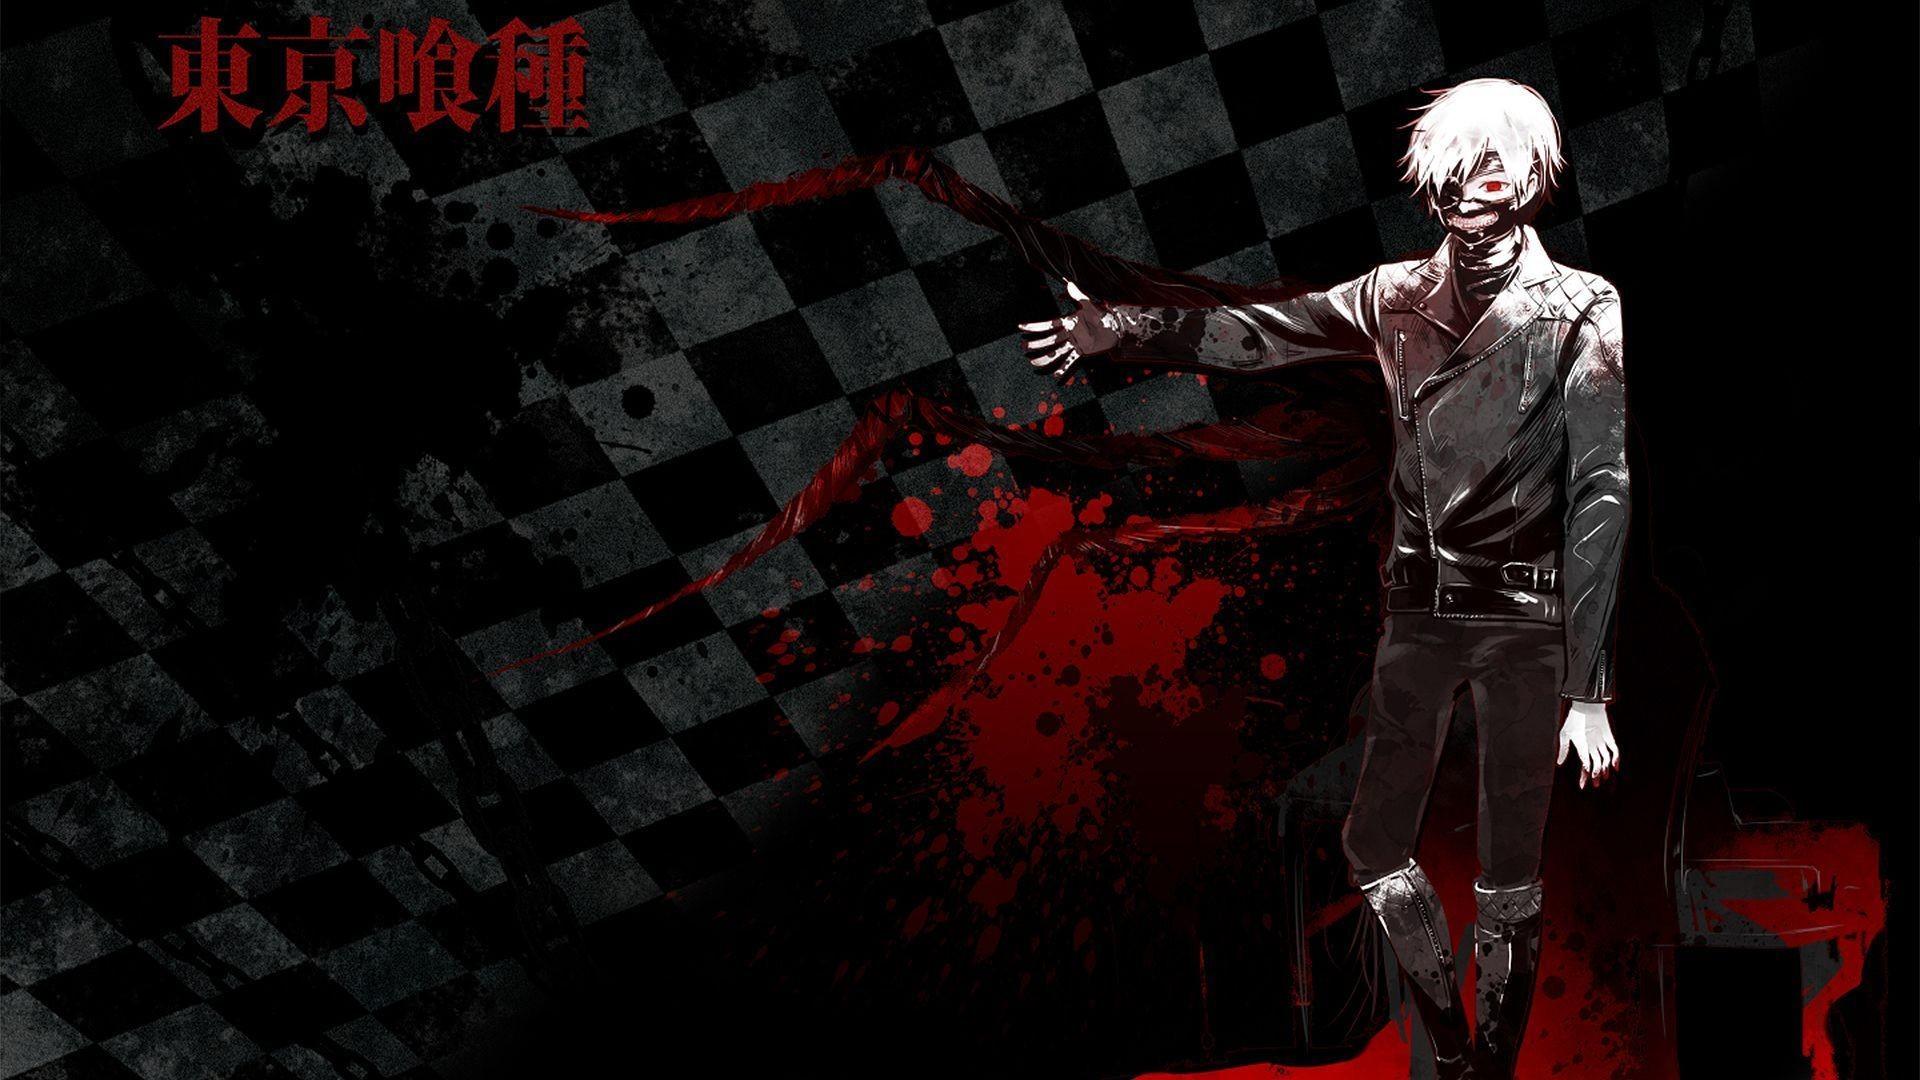 Tokyo Ghoul Wallpaper Ken Kaneki 2253434 Hd Wallpaper Backgrounds Download